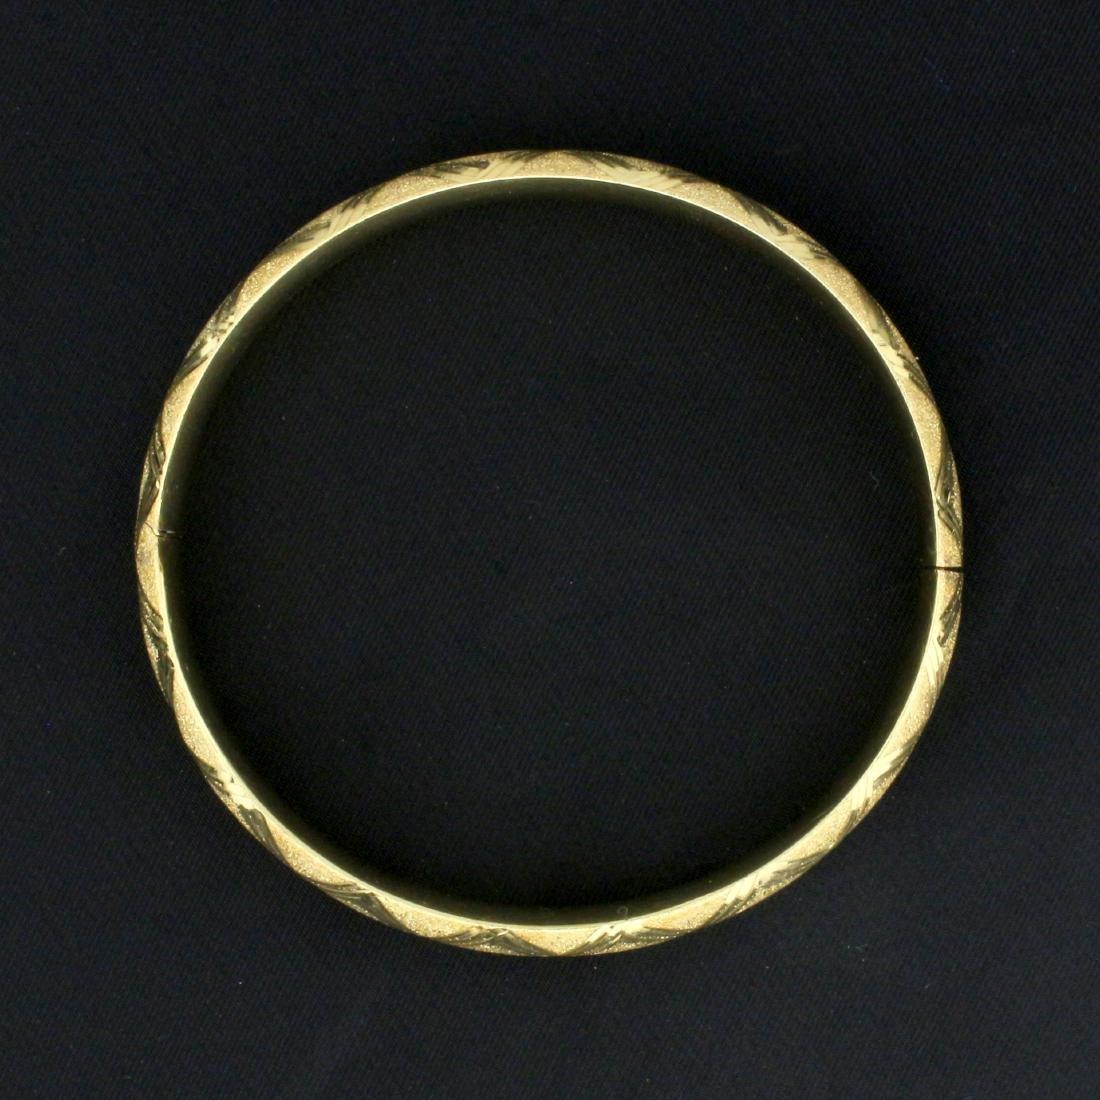 8mm Hinged Bangle Bracelet in 14K Yellow Gold - 2